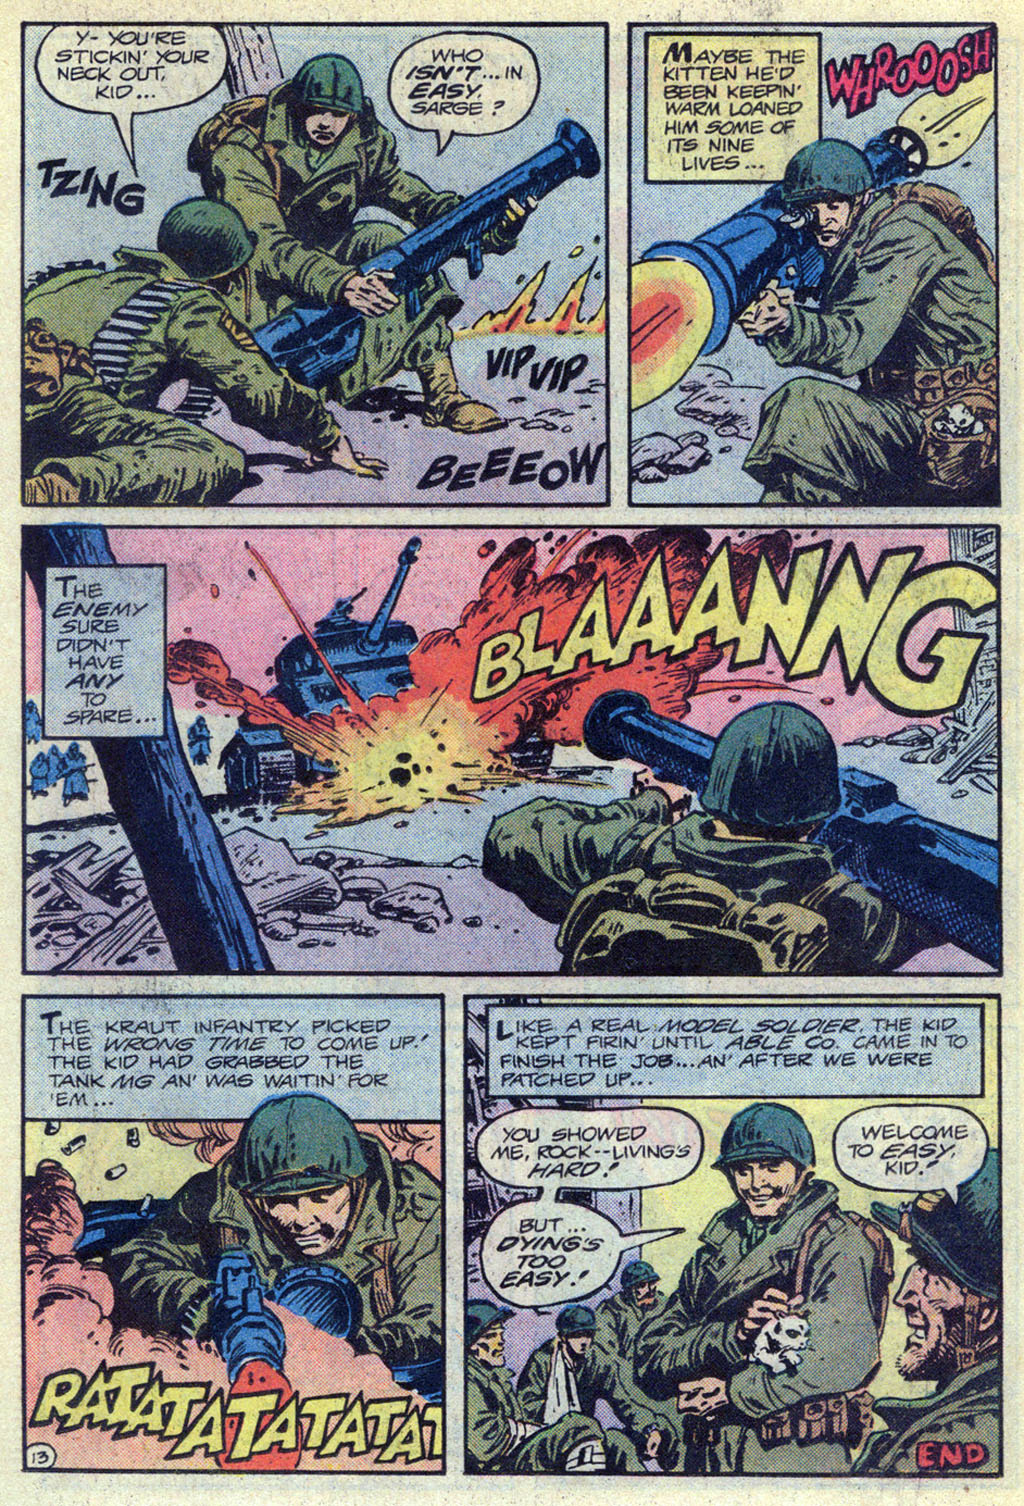 Read online Sgt. Rock comic -  Issue #369 - 13